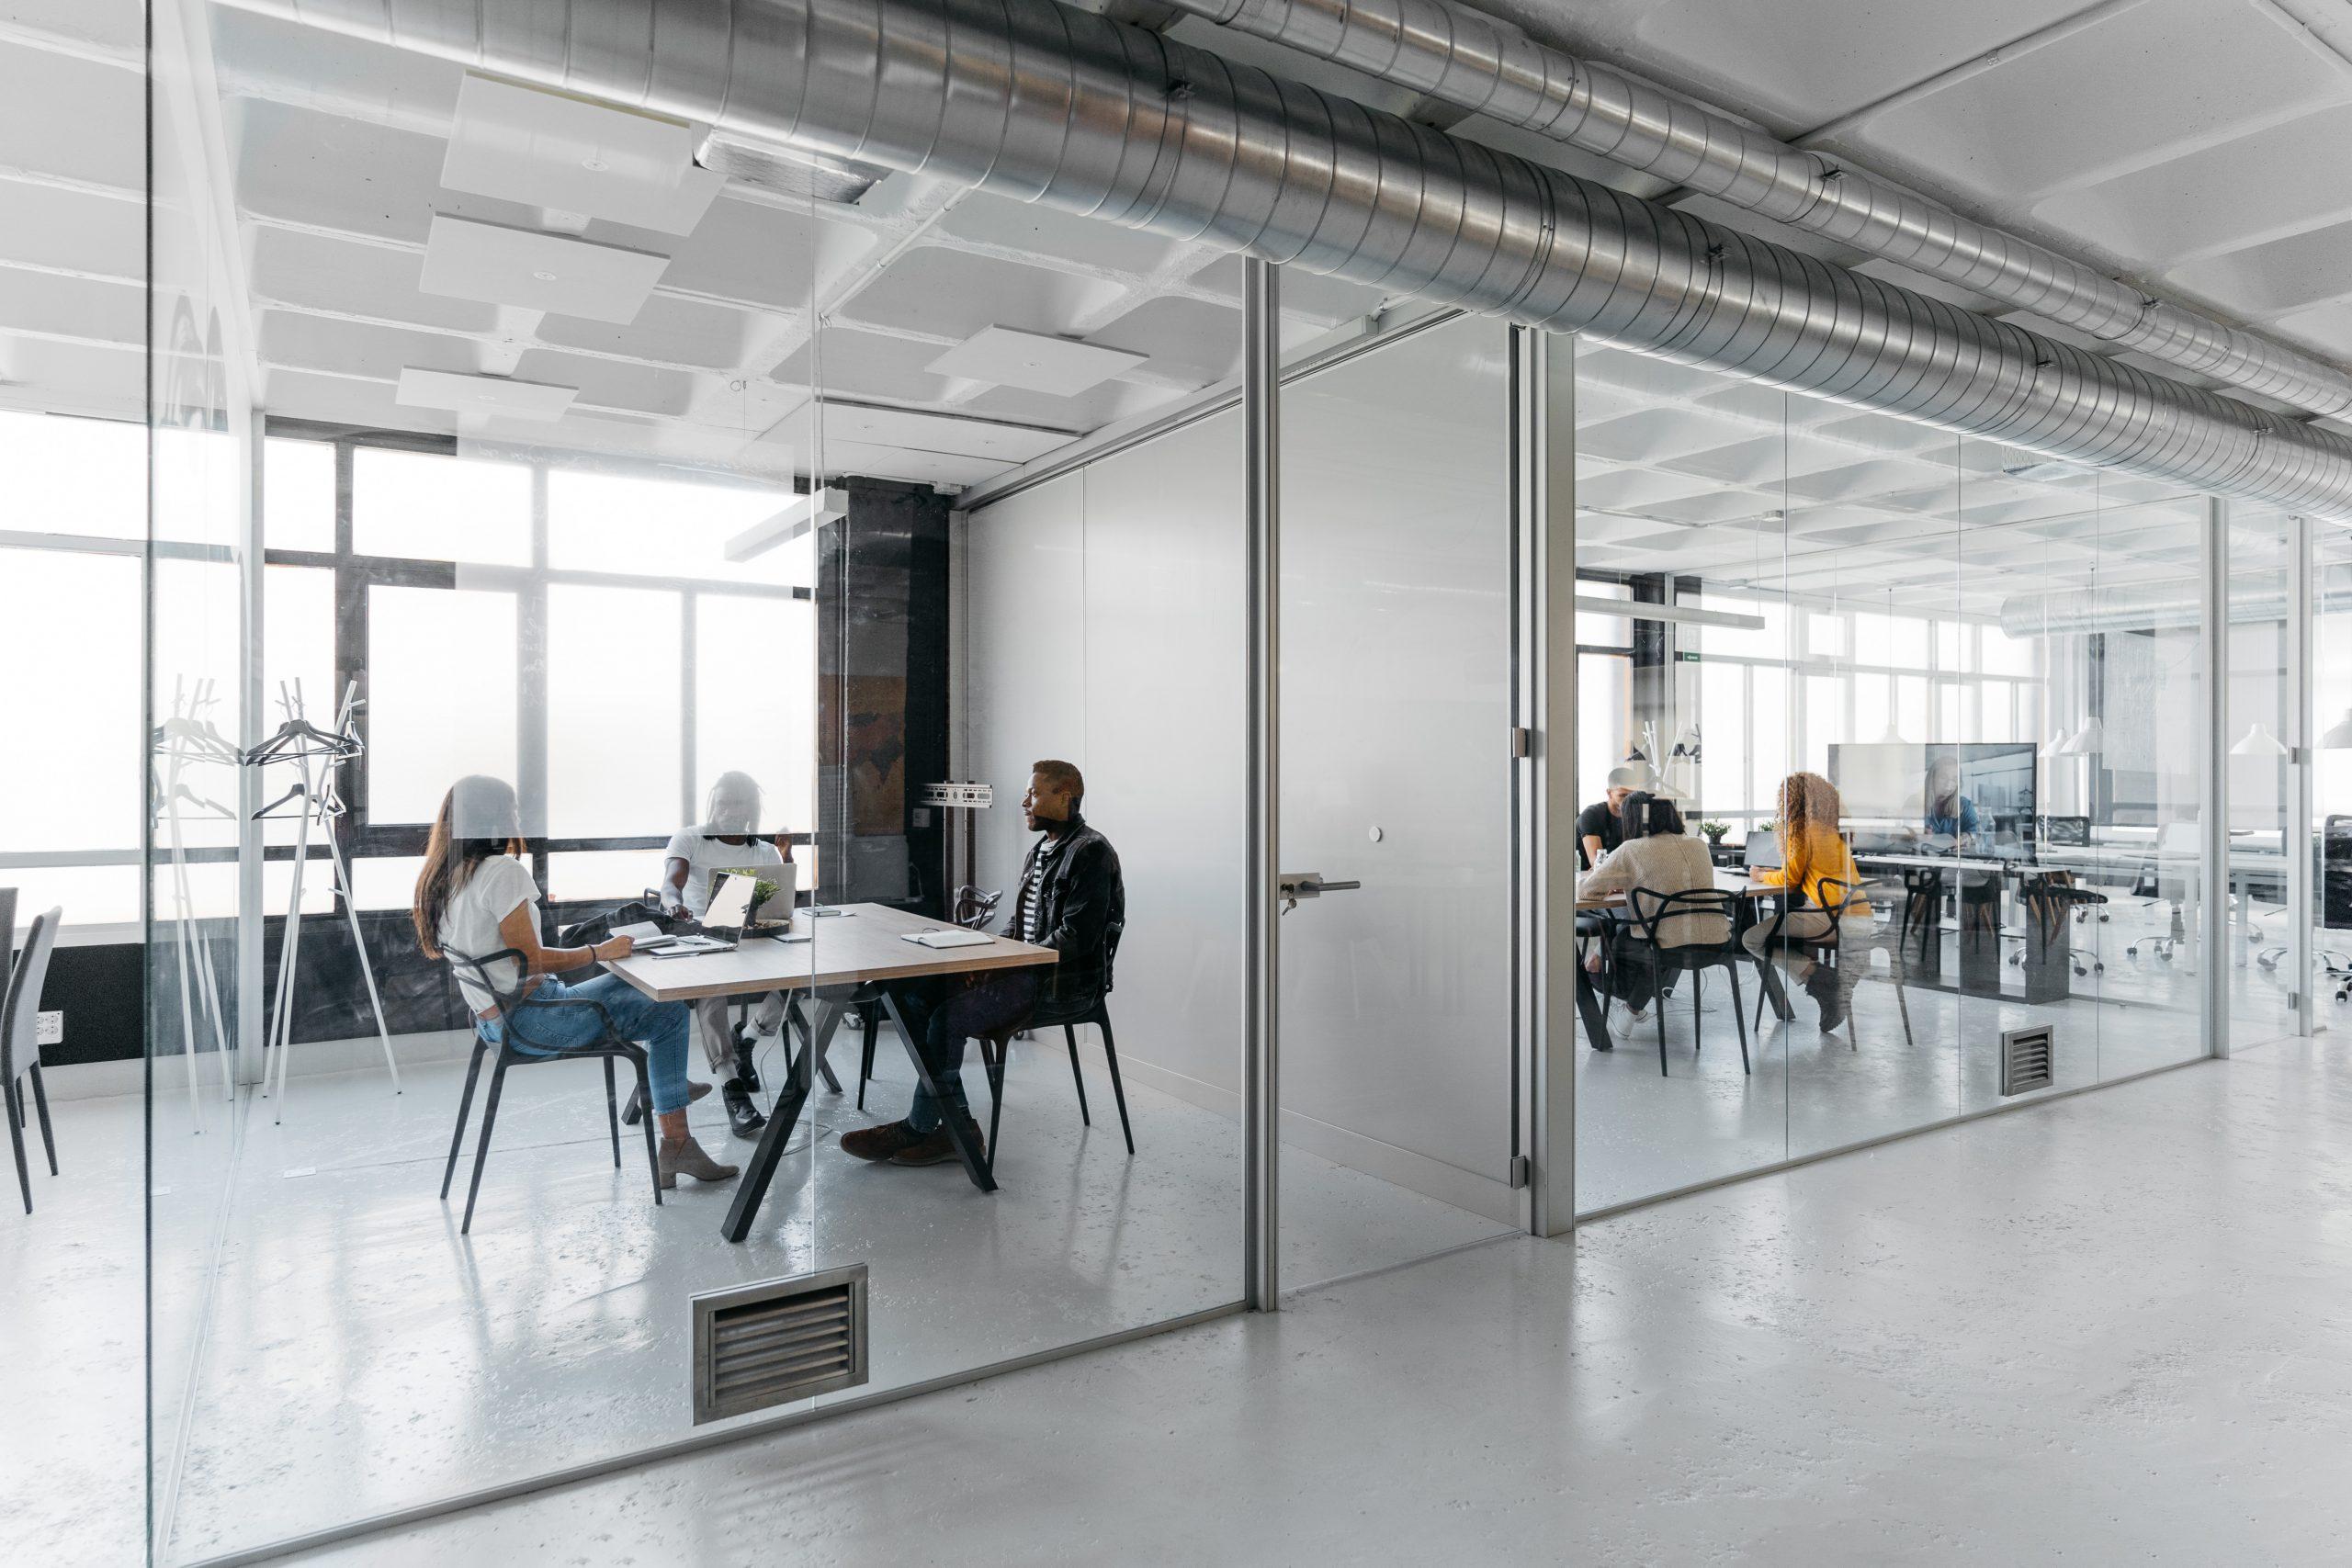 salas-reuniones-bilbao-biworking-emprendimiento-empresas